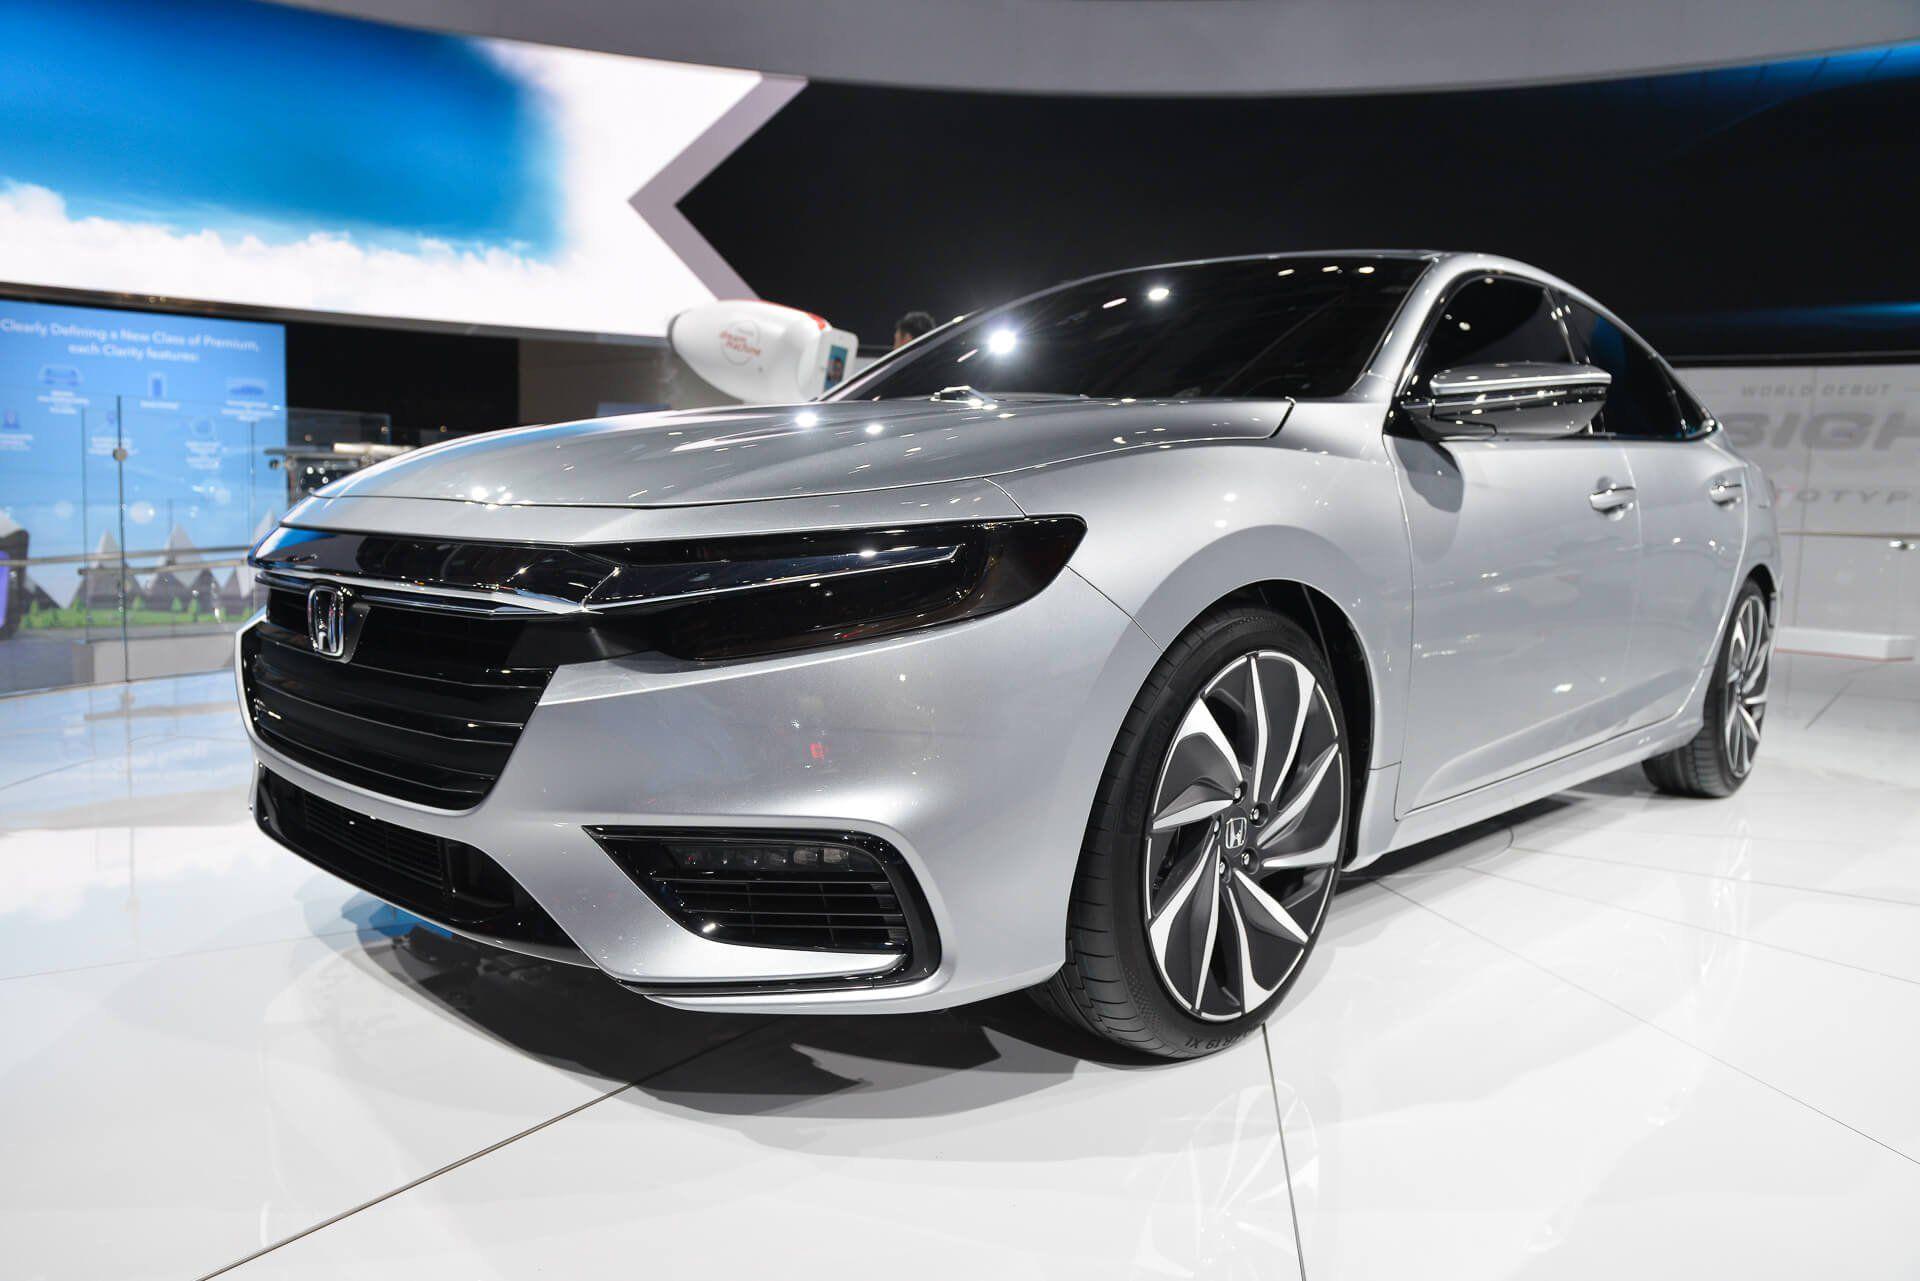 Honda Civic 2020 Facelift Model from Honda Sneak Preview